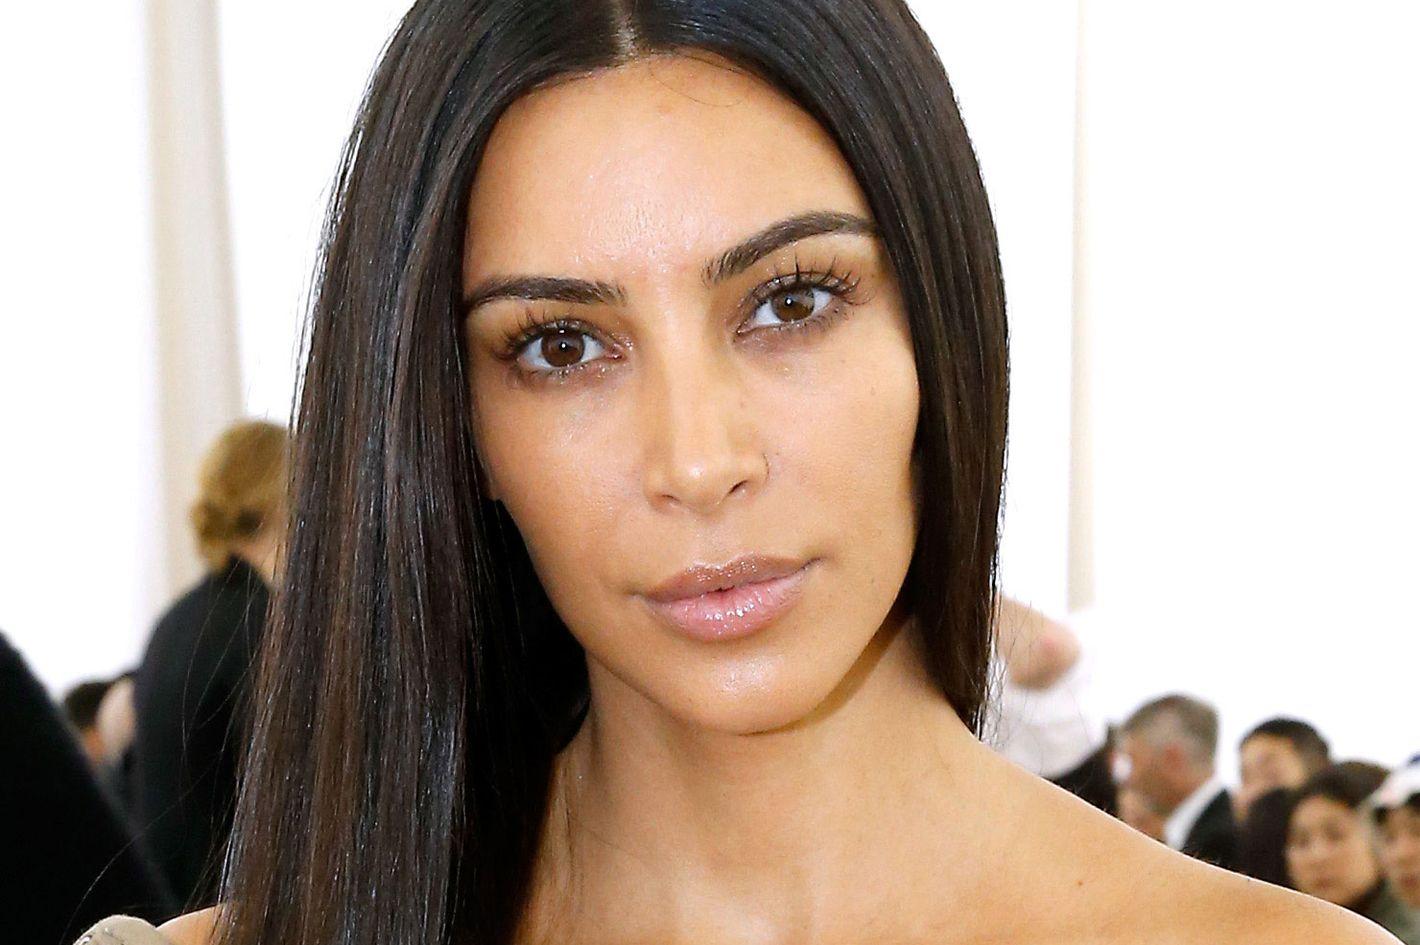 Will Kim Kardashian enter politics?